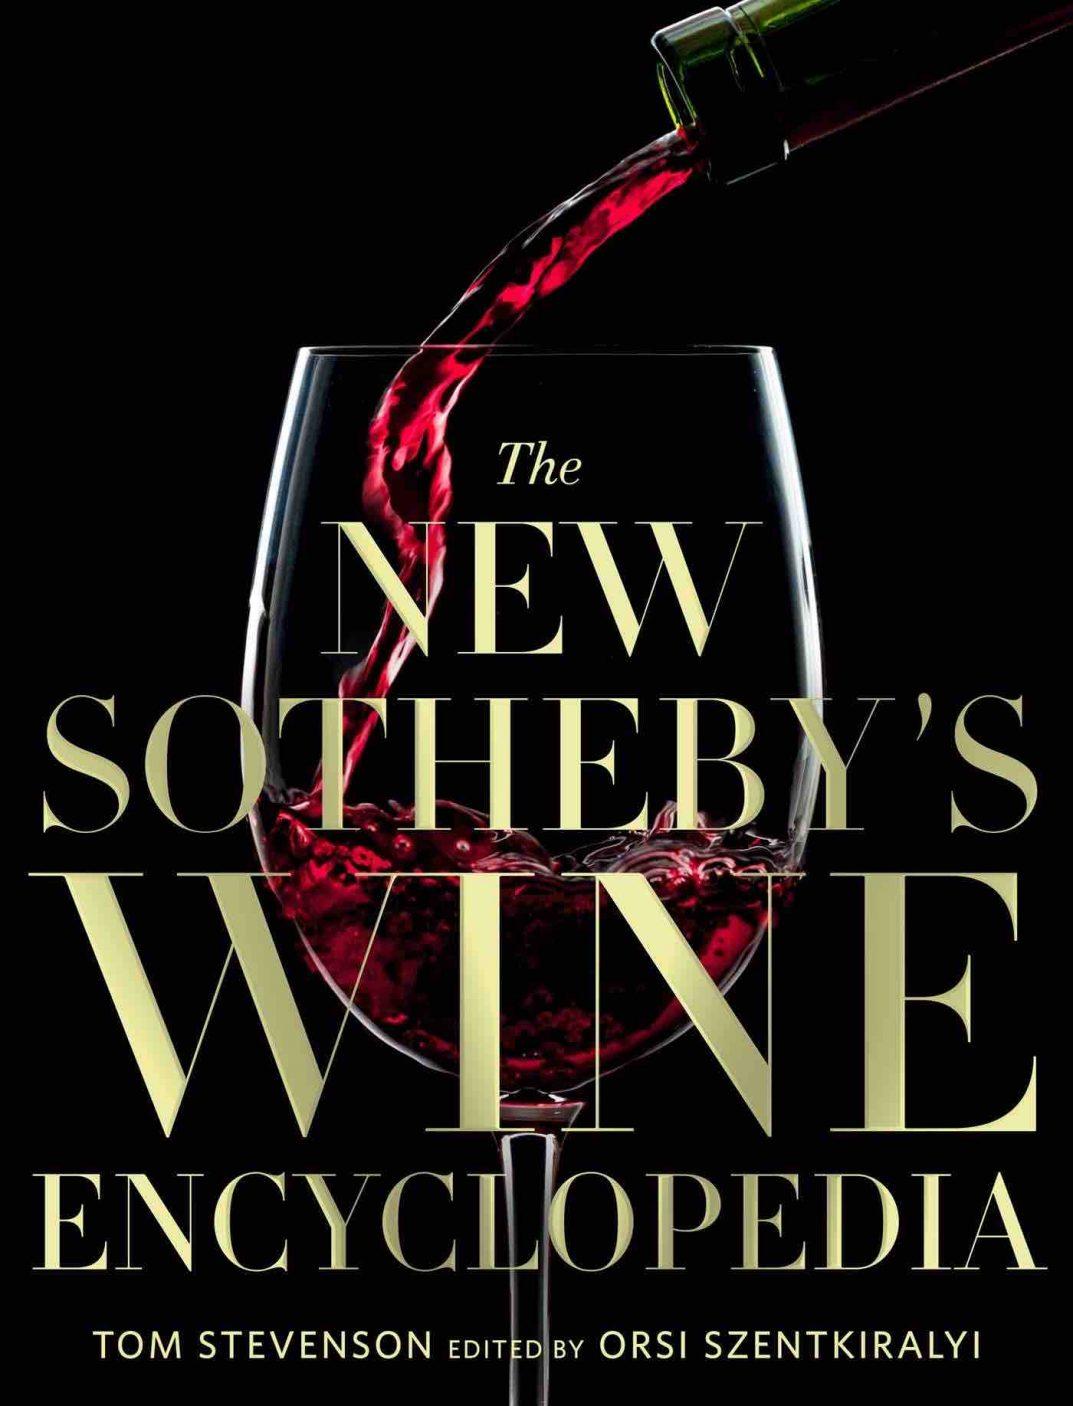 New Sotheby's Wine Encyclopedia